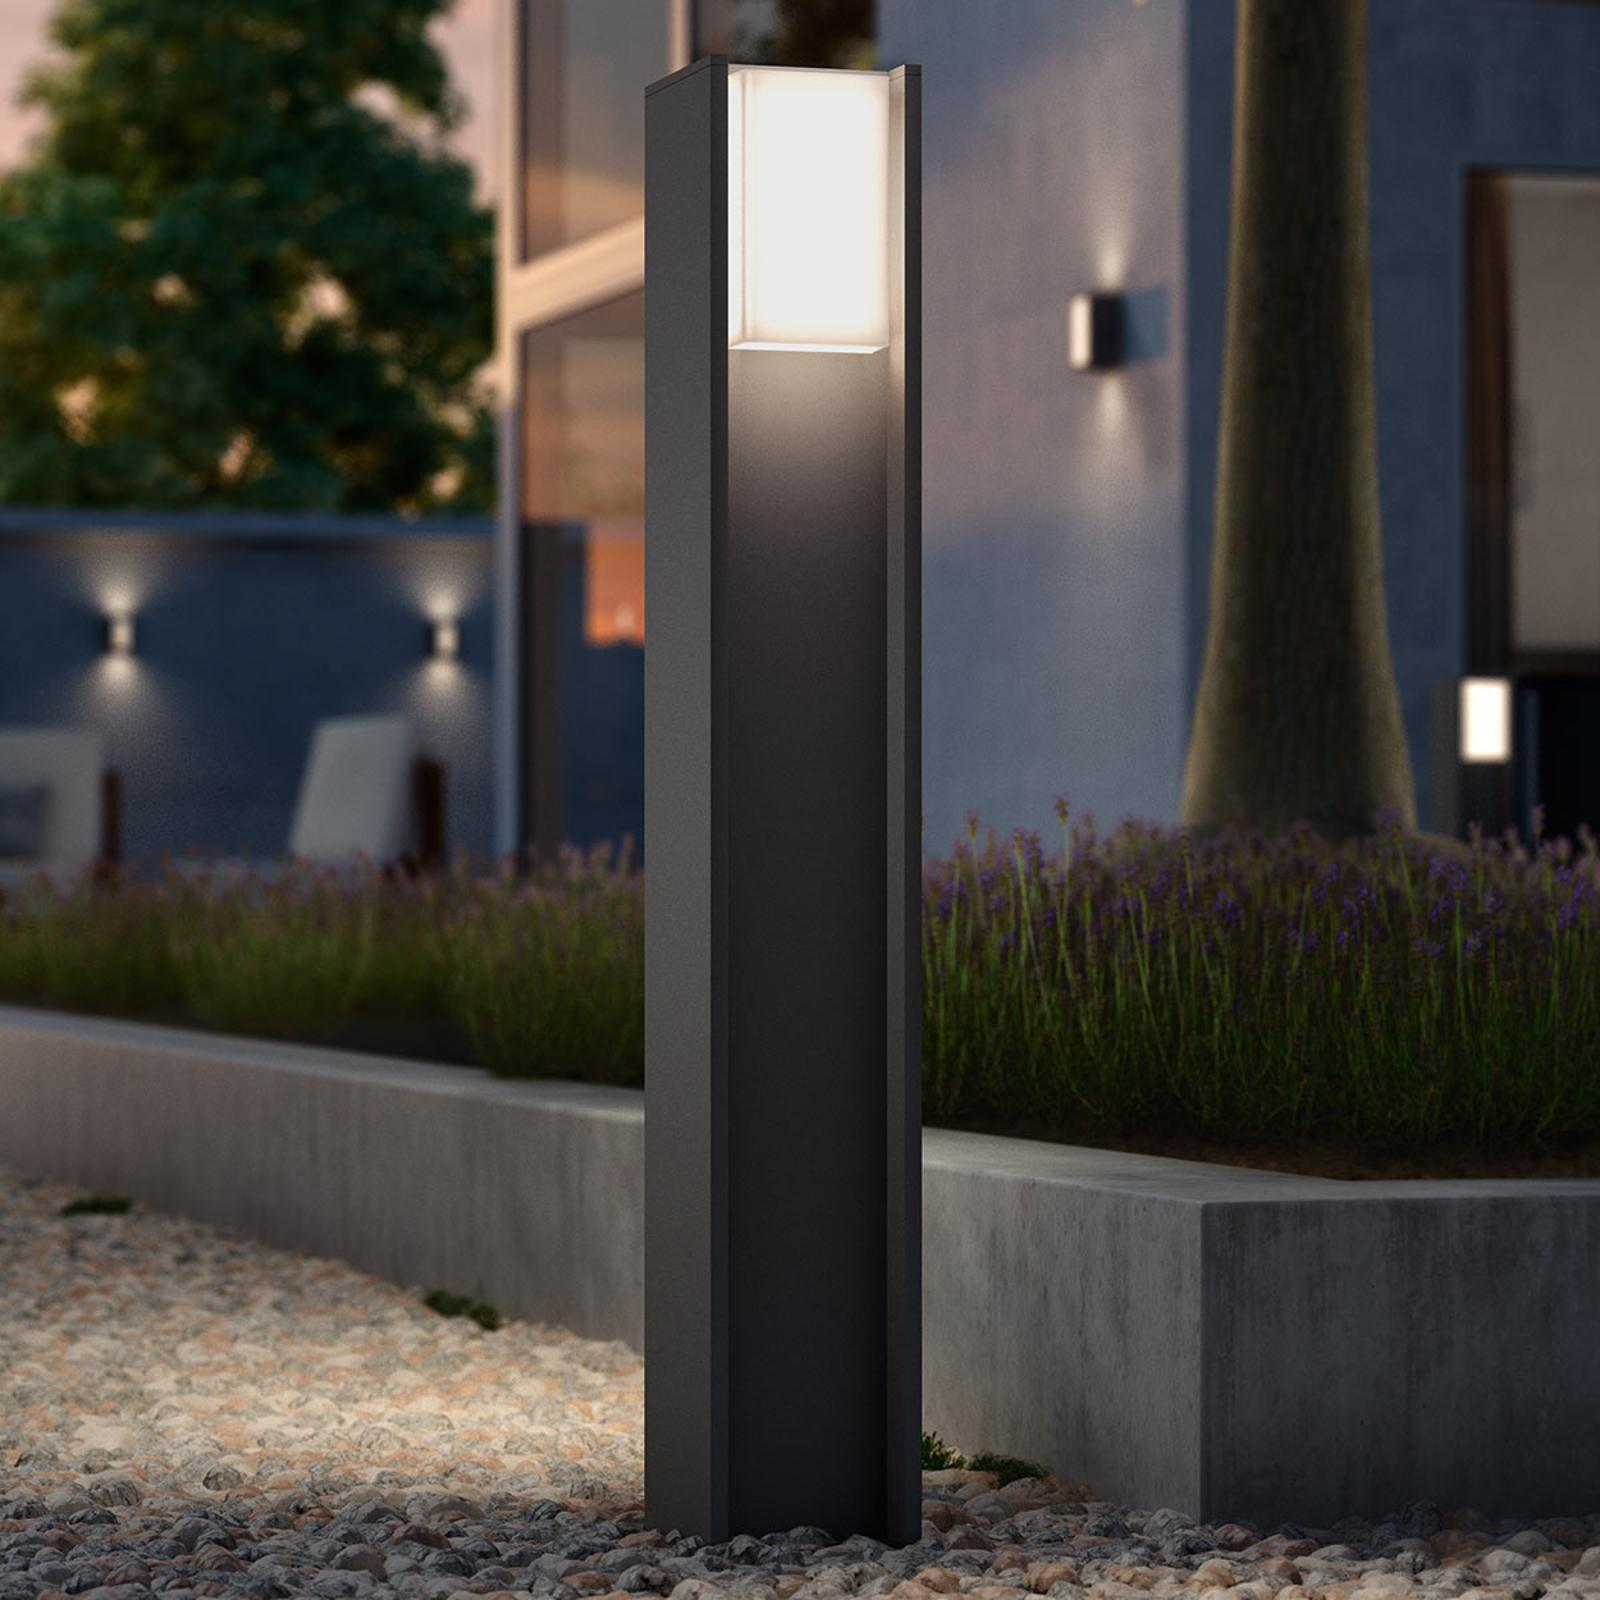 Philips Hue White Turaco LED-Wegelampe steuerbar